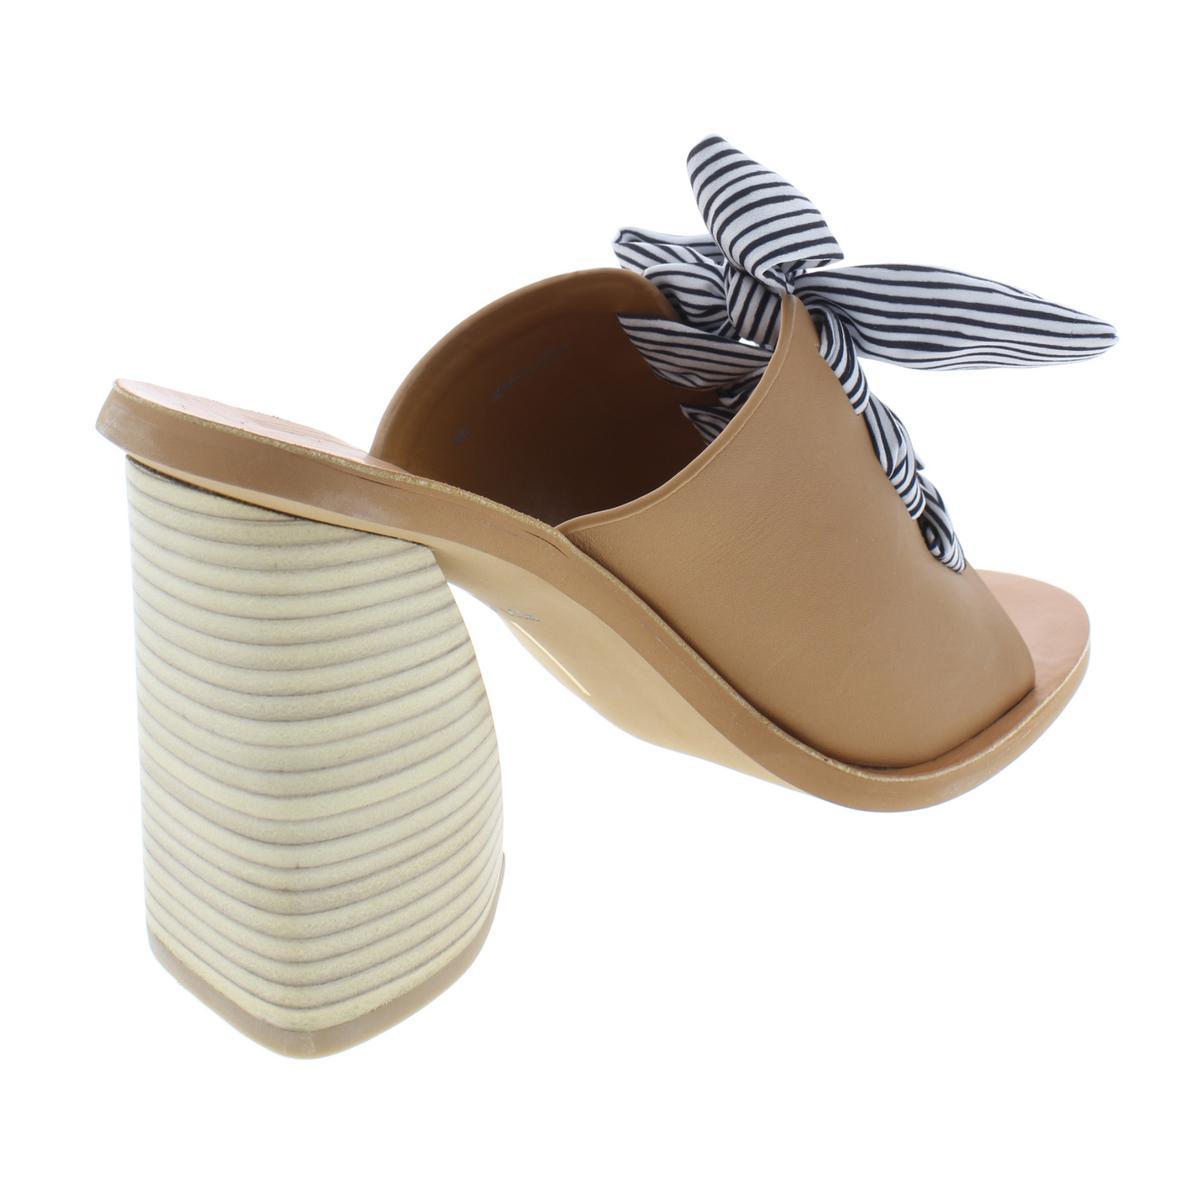 Dolce-Vita-Womens-Amber-Leather-Open-Toe-Slip-On-Heels-Sandals-BHFO-8080 thumbnail 6